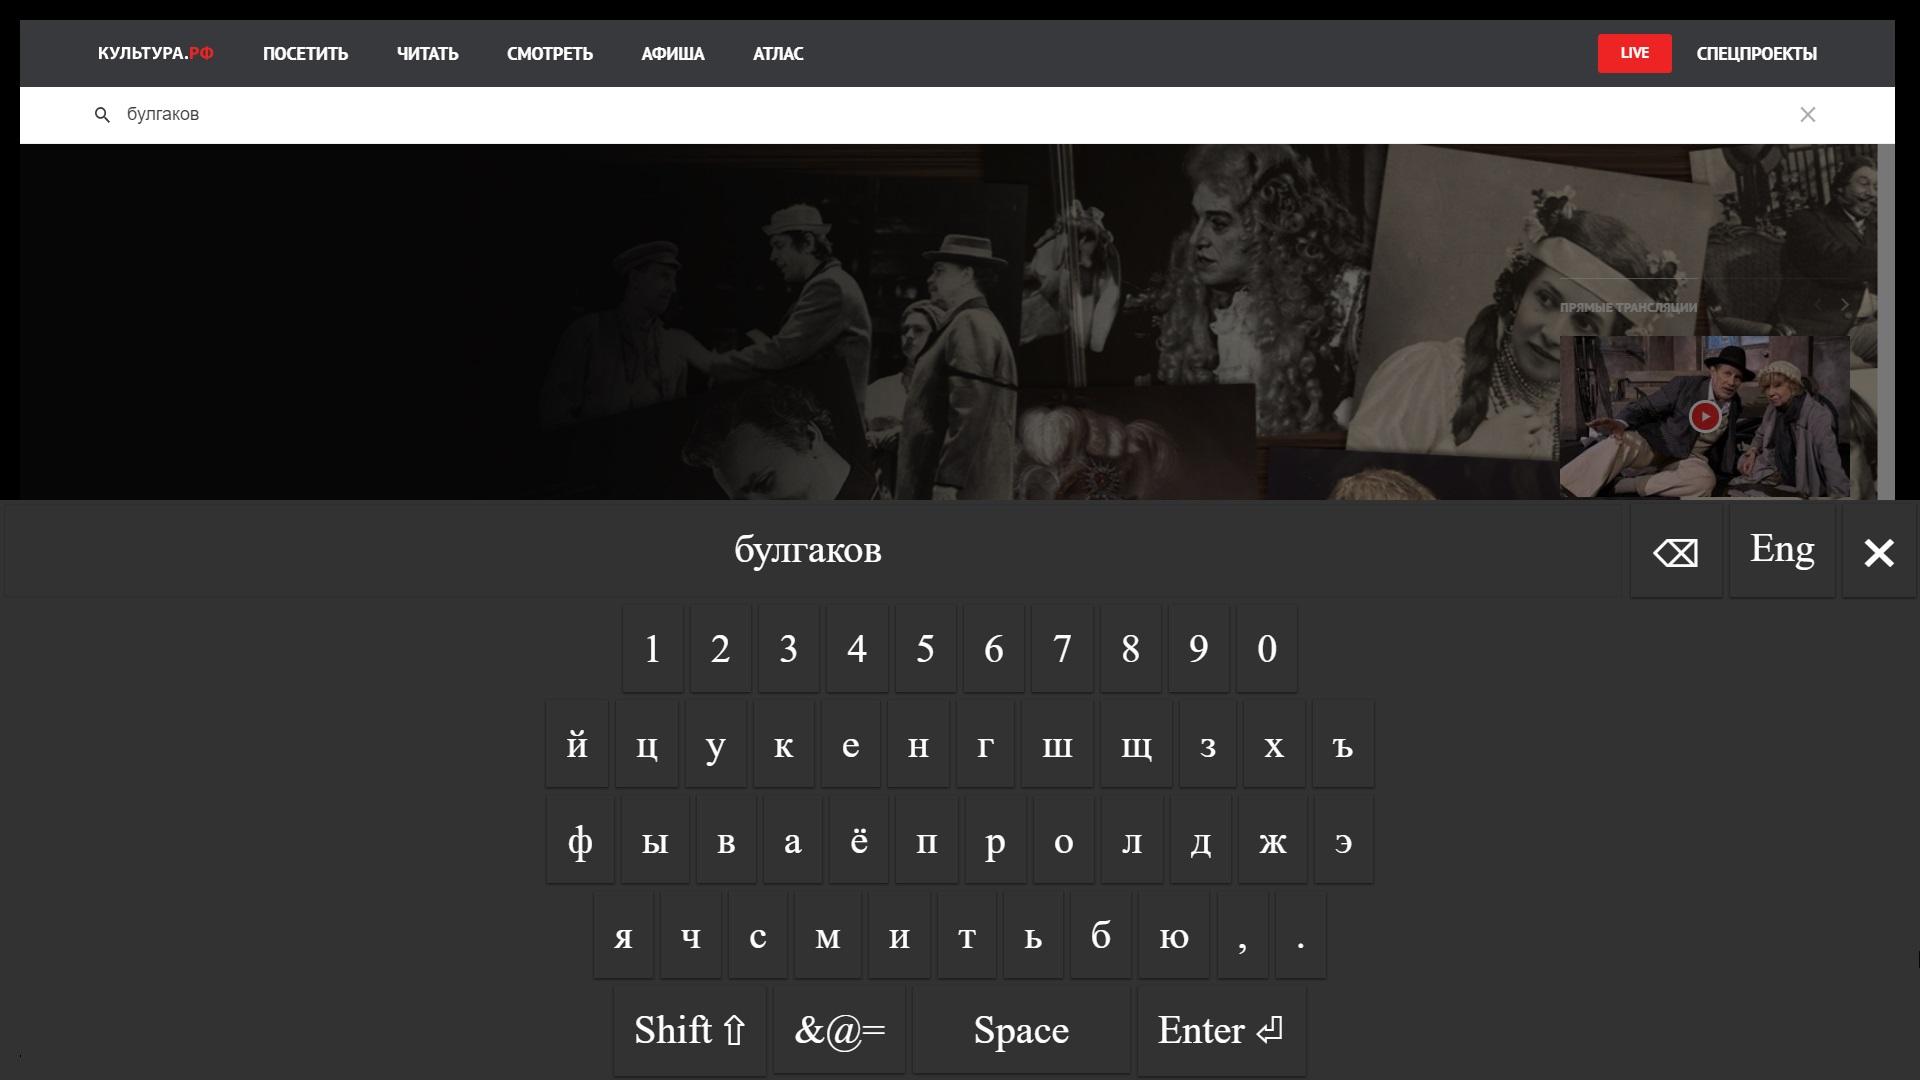 elis-kiosk-keyboard.jpg